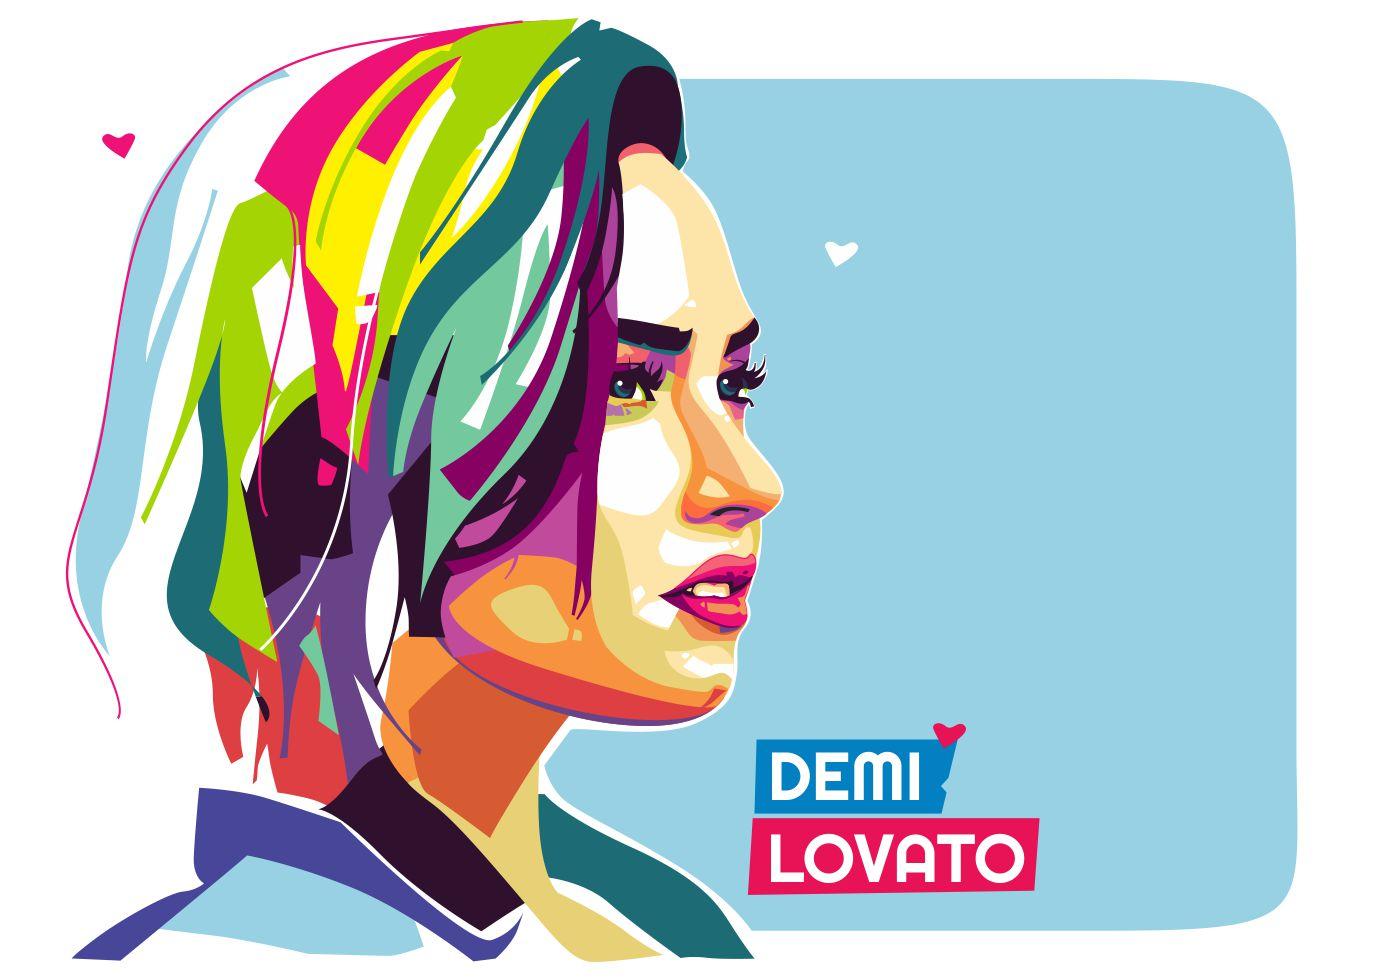 Cute Baby Hijab Wallpaper Demi Lovato Vector Popart Portrait Download Free Vector